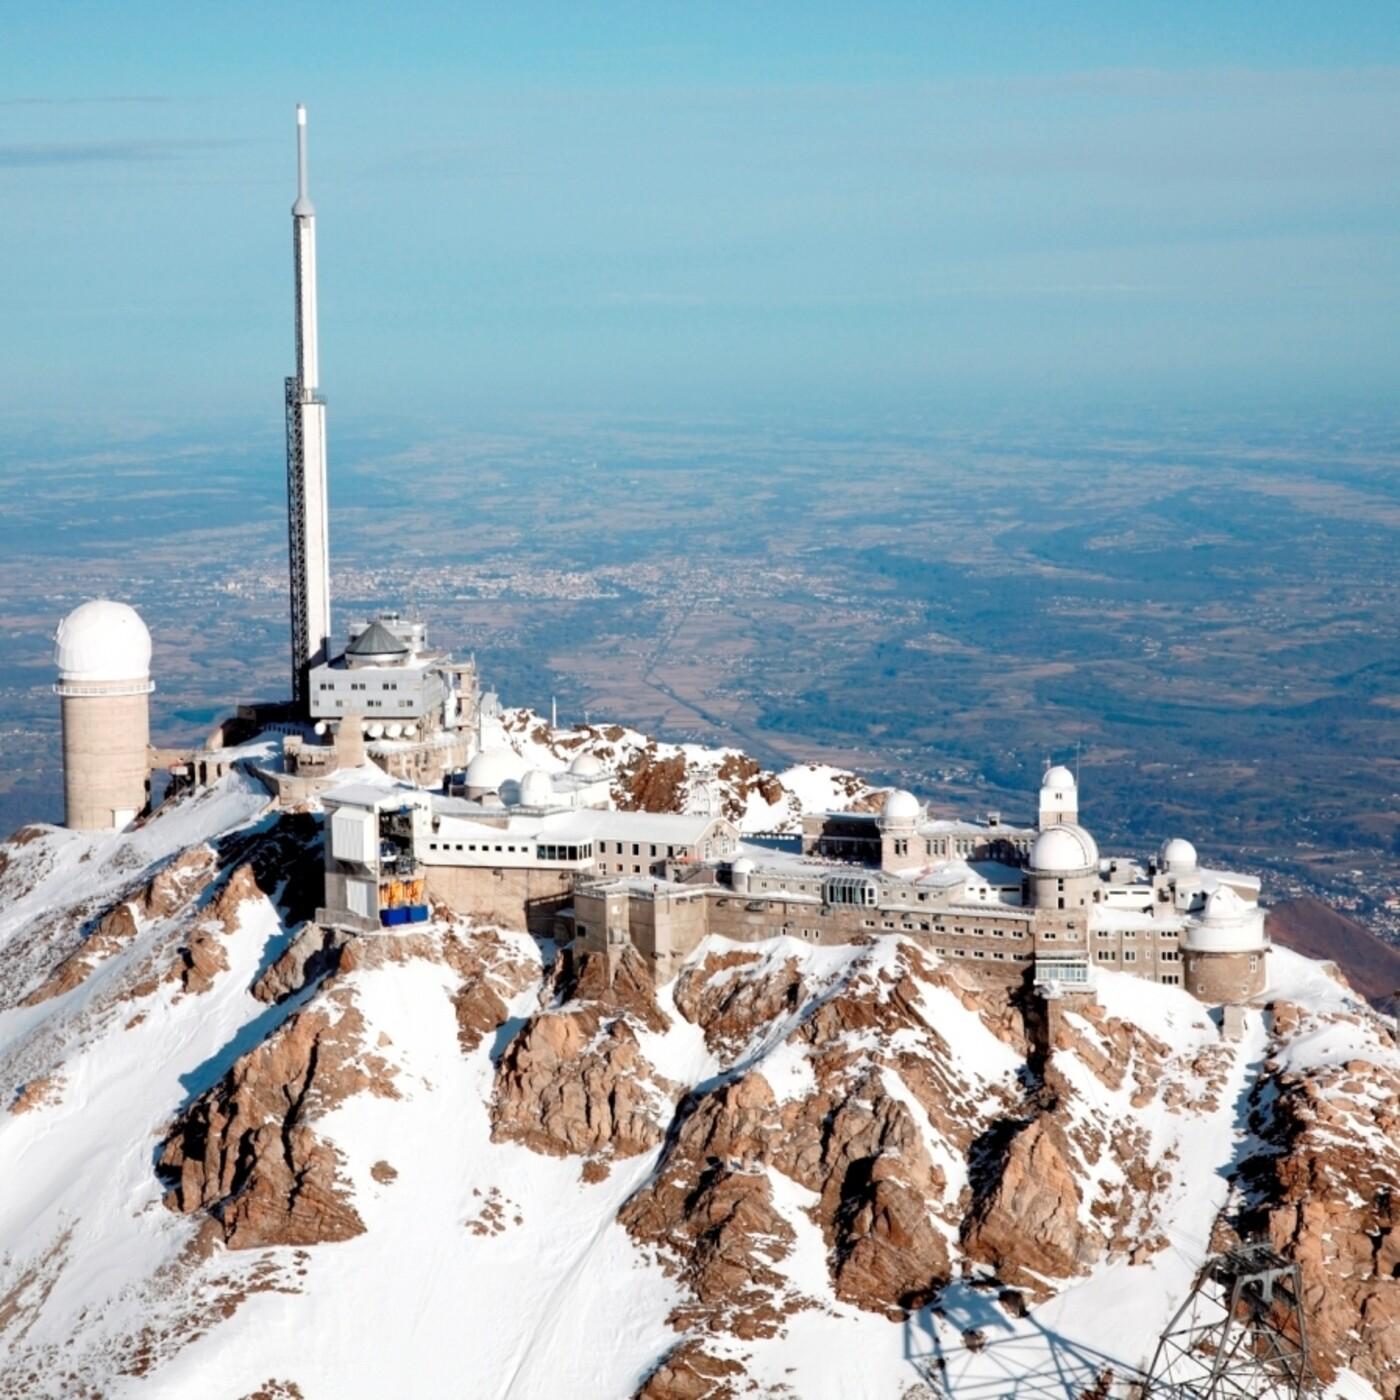 PIC DU MIDI DU BIGORRE (2.877m) Icono Pirineo para trail, esqui, btt y más. #radiotrail Mayayo